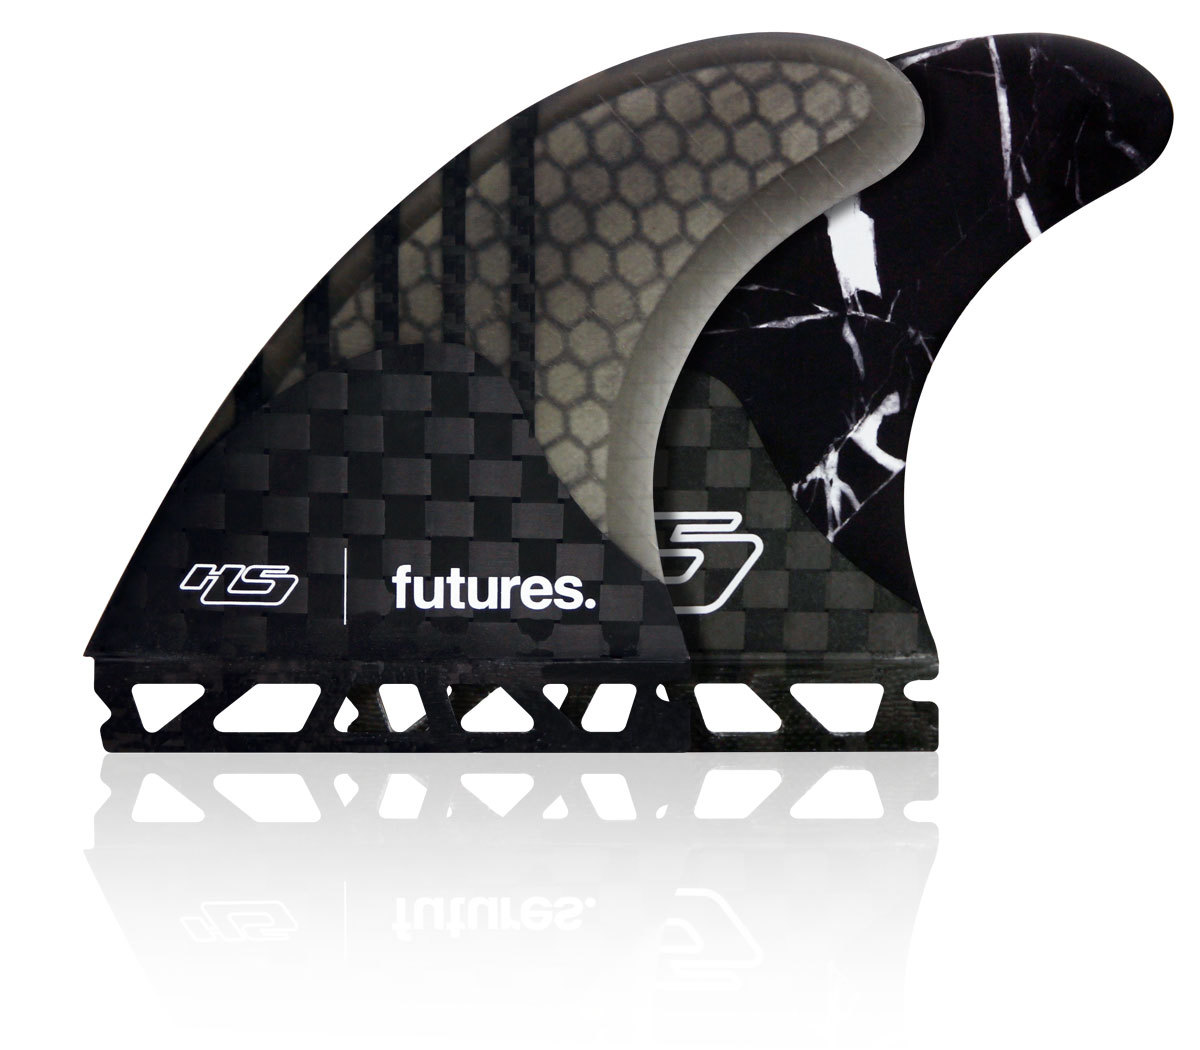 Futures HS 1 Large Generation image